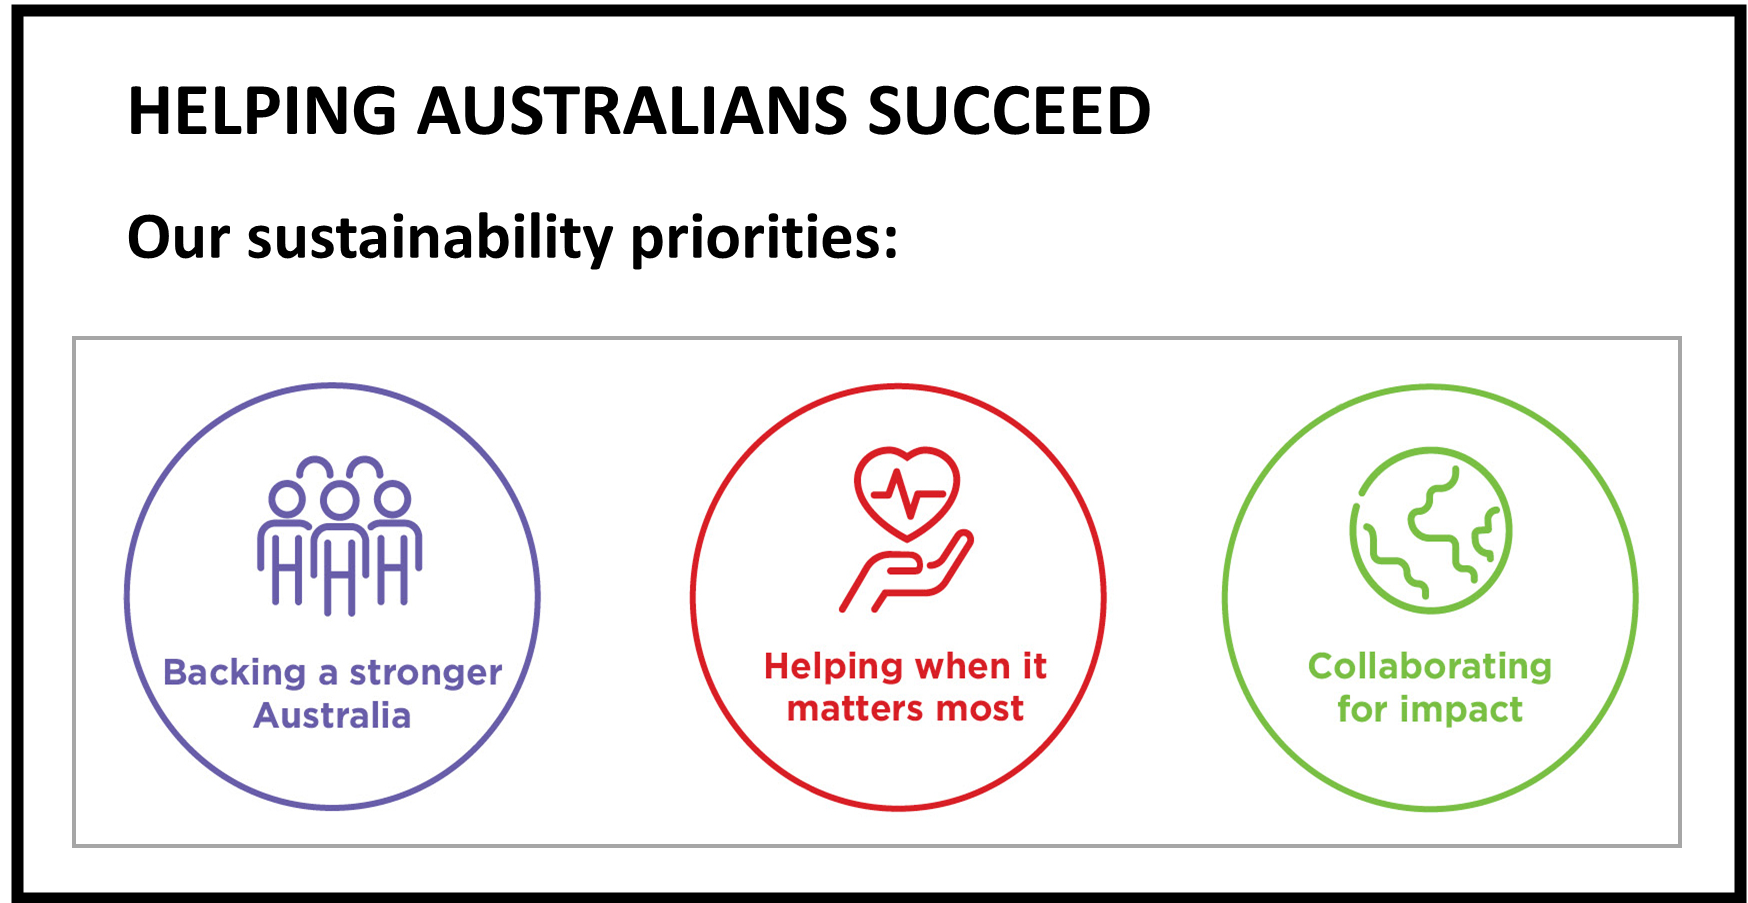 Westpac Report Image Sustainability Priorities Infographic